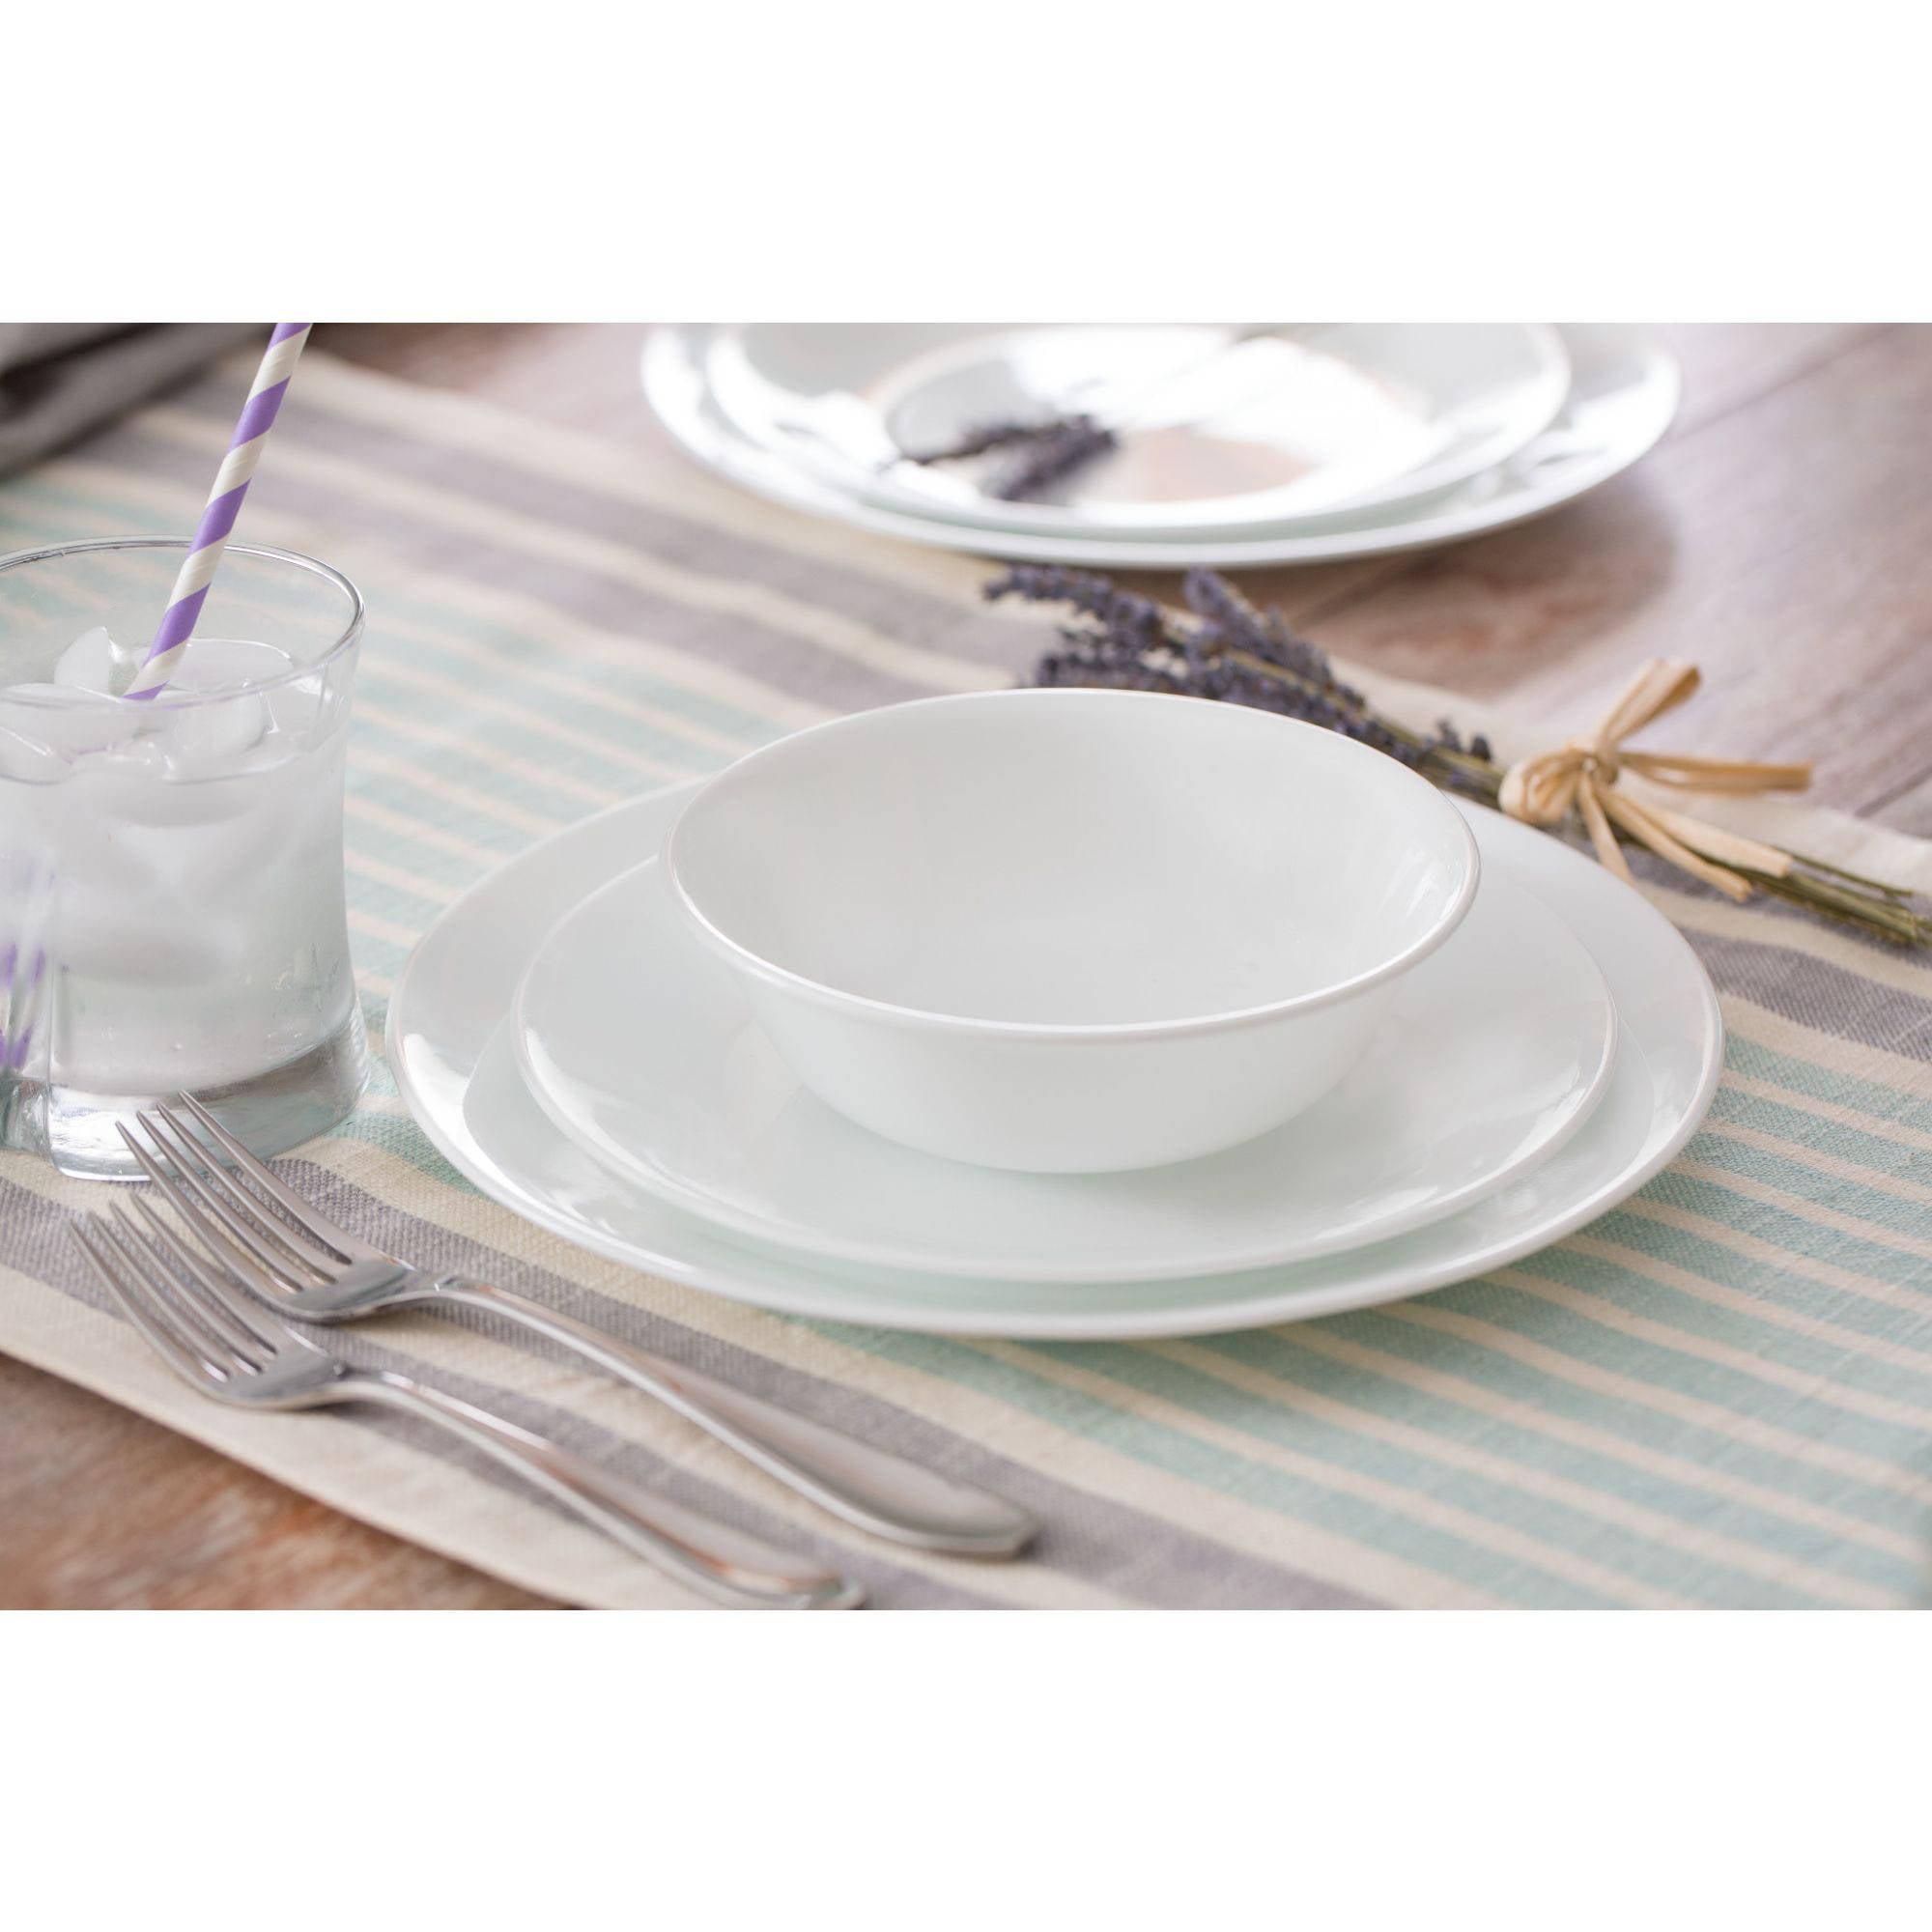 Corelle Livingware Winter Frost 16-Piece Dinnerware Set